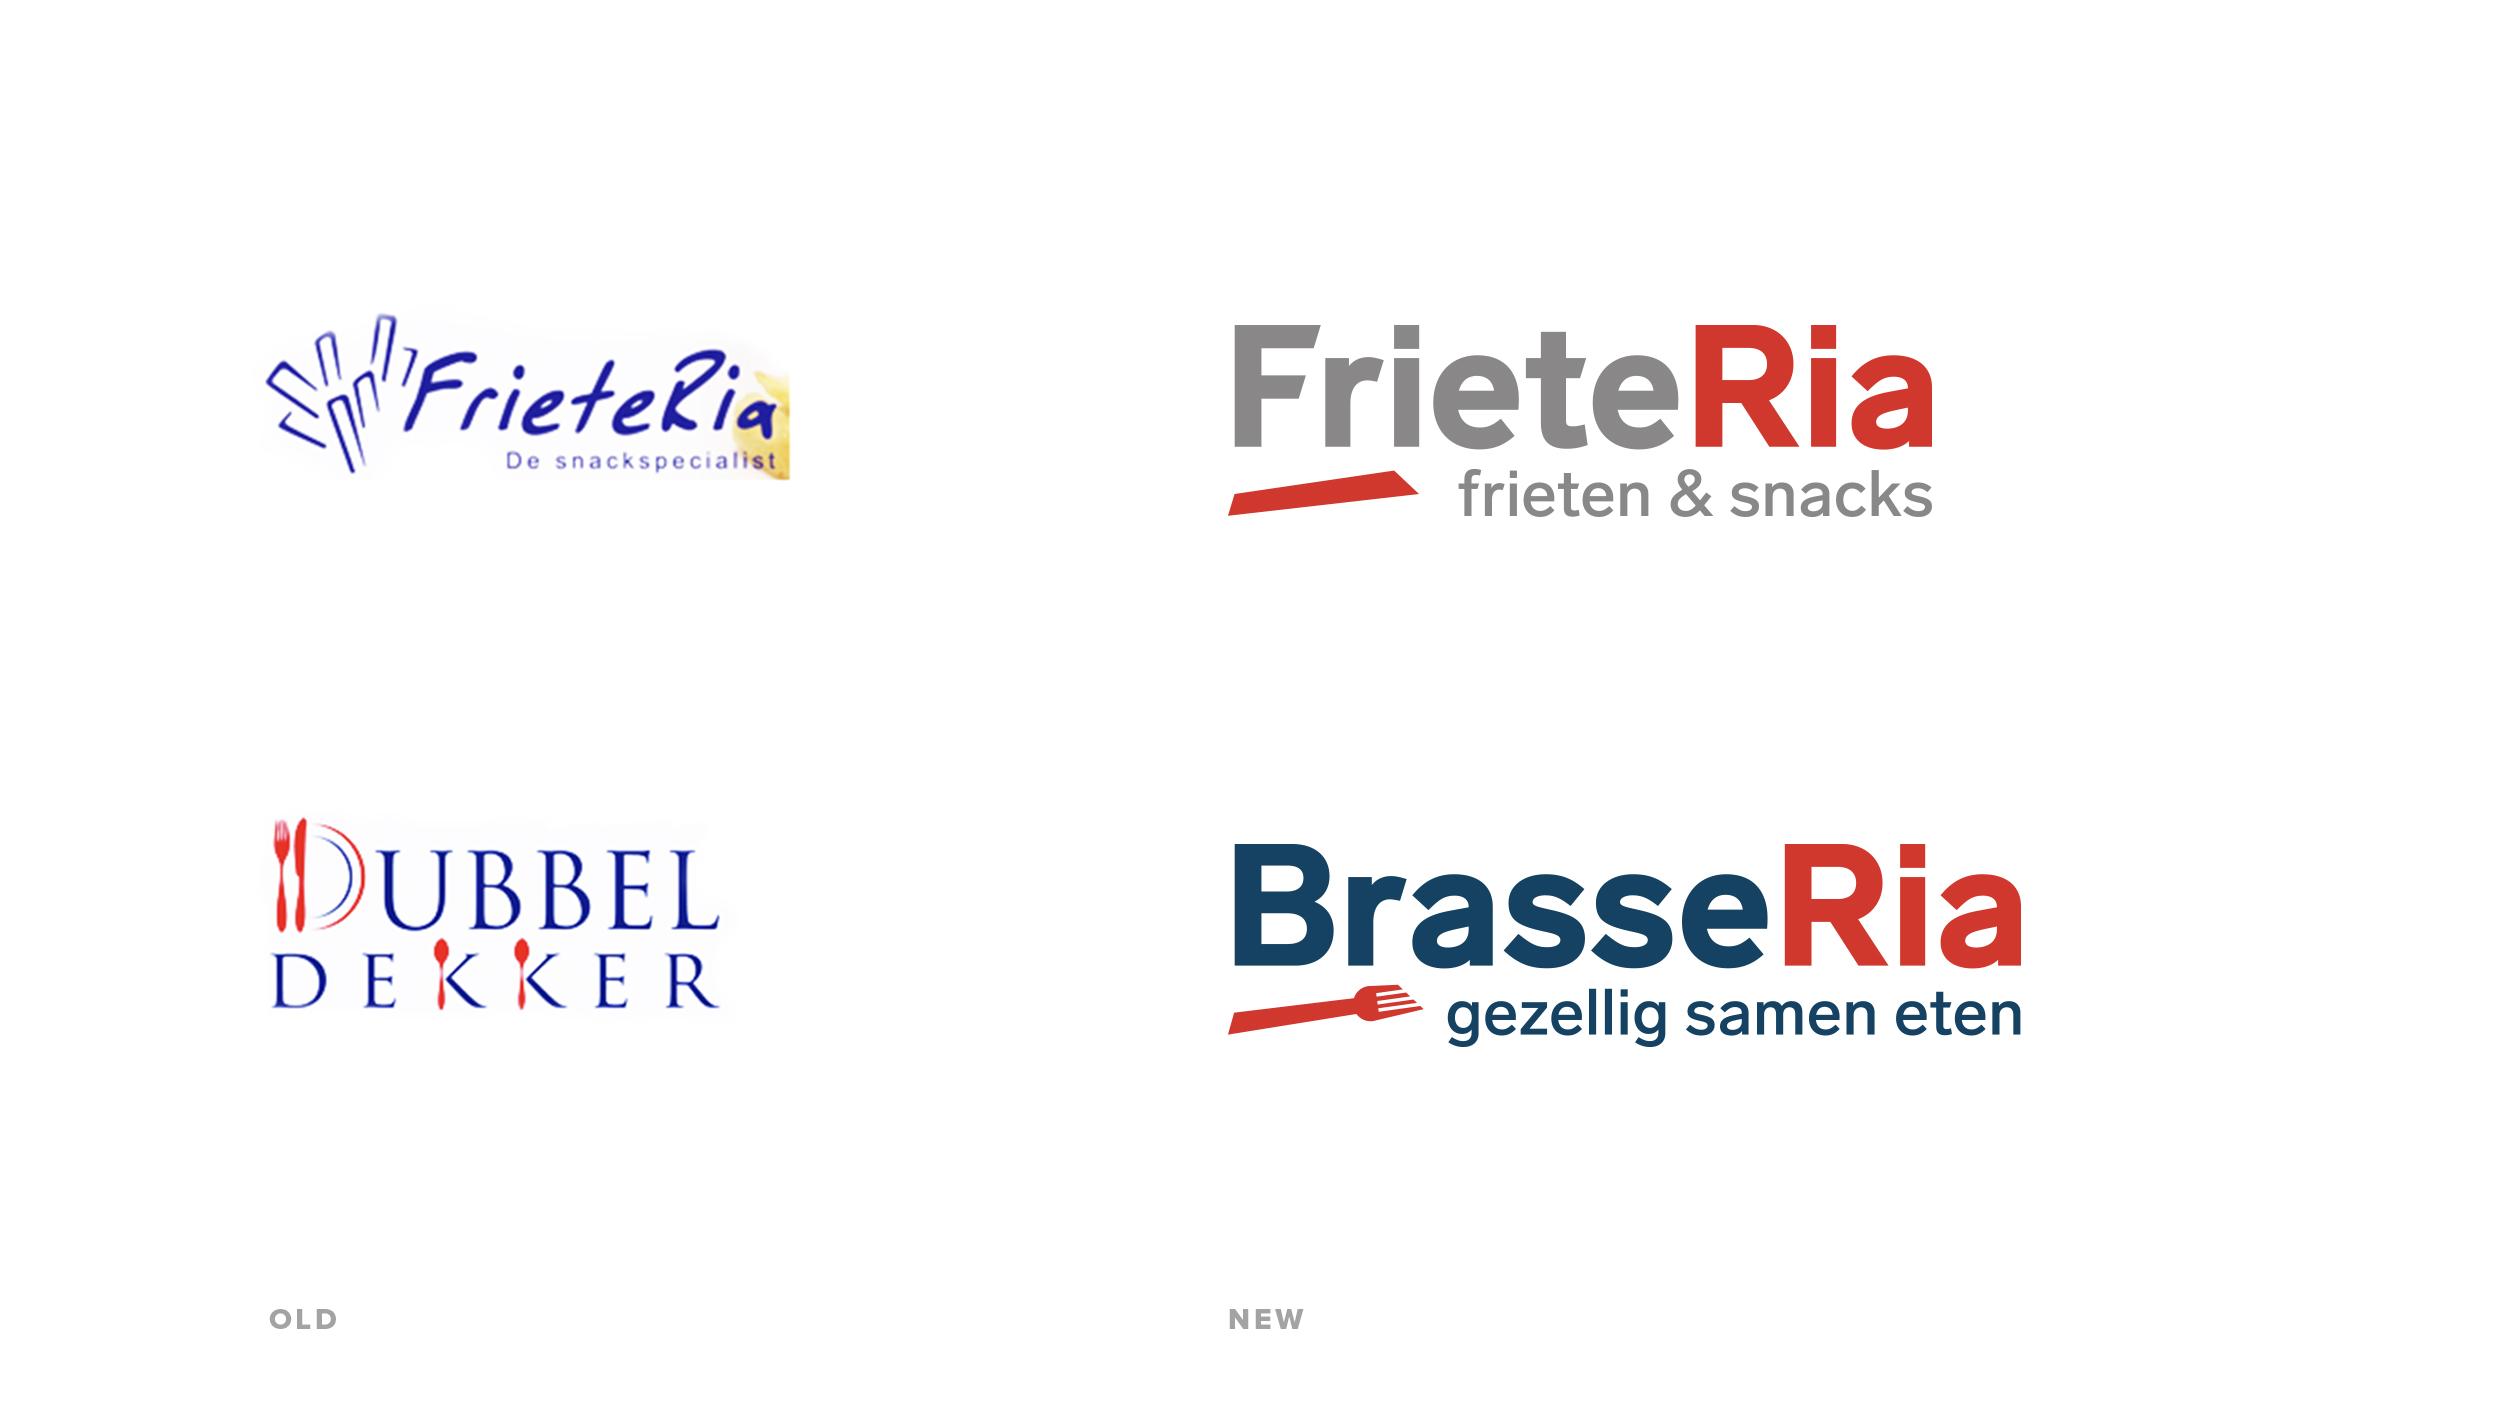 Oud & nieuwe logo's